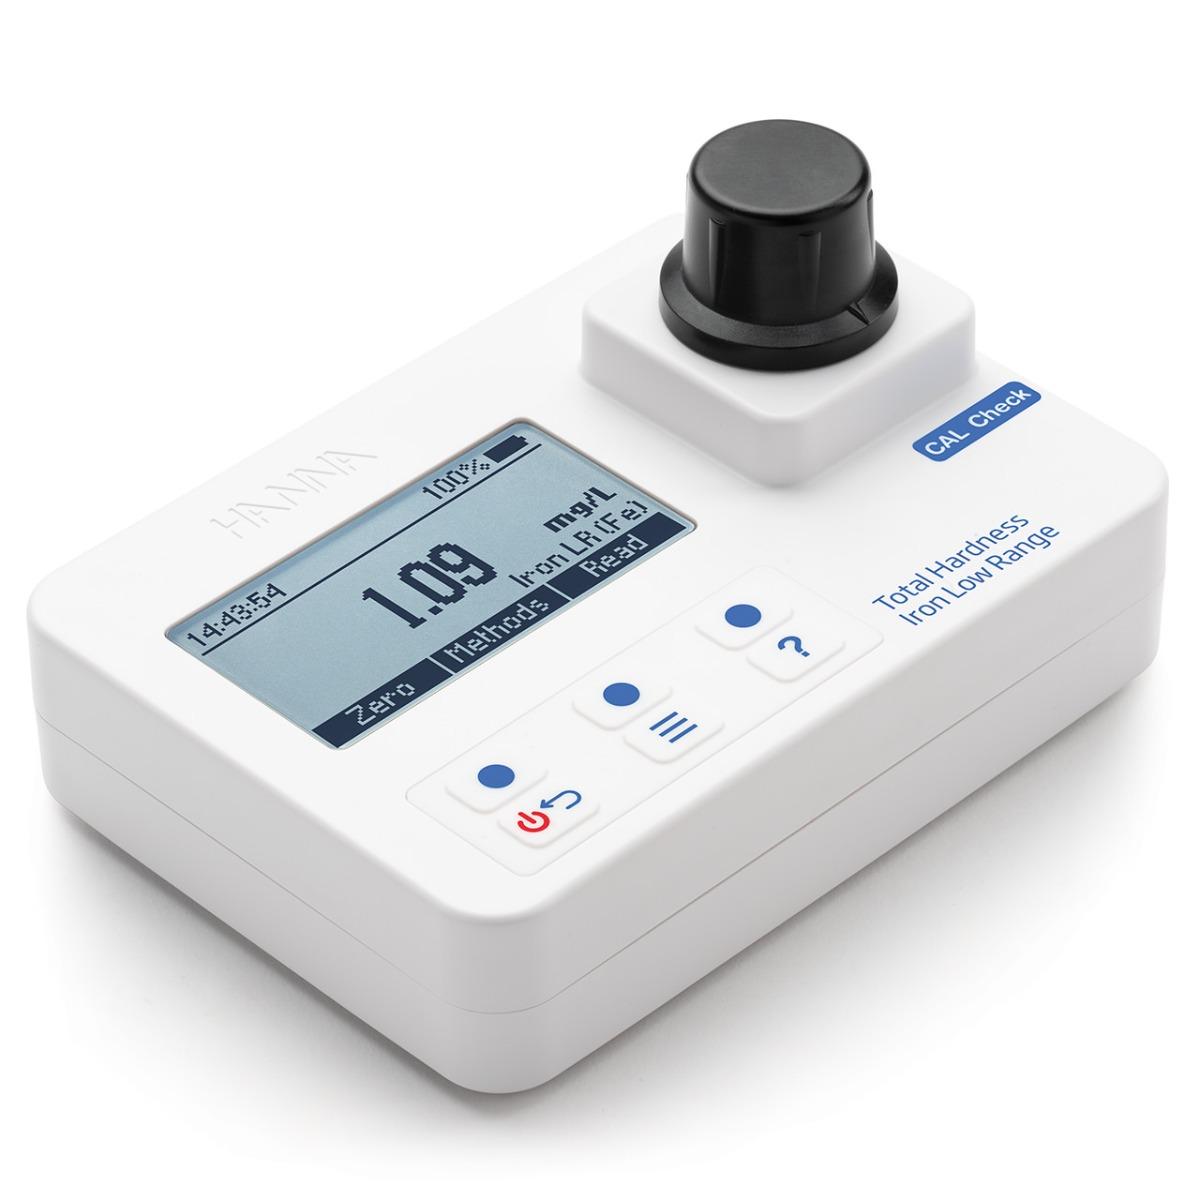 HI97741 - Fotometro portatile multiparametro per Durezza Totale e Ferro Scala Bassa